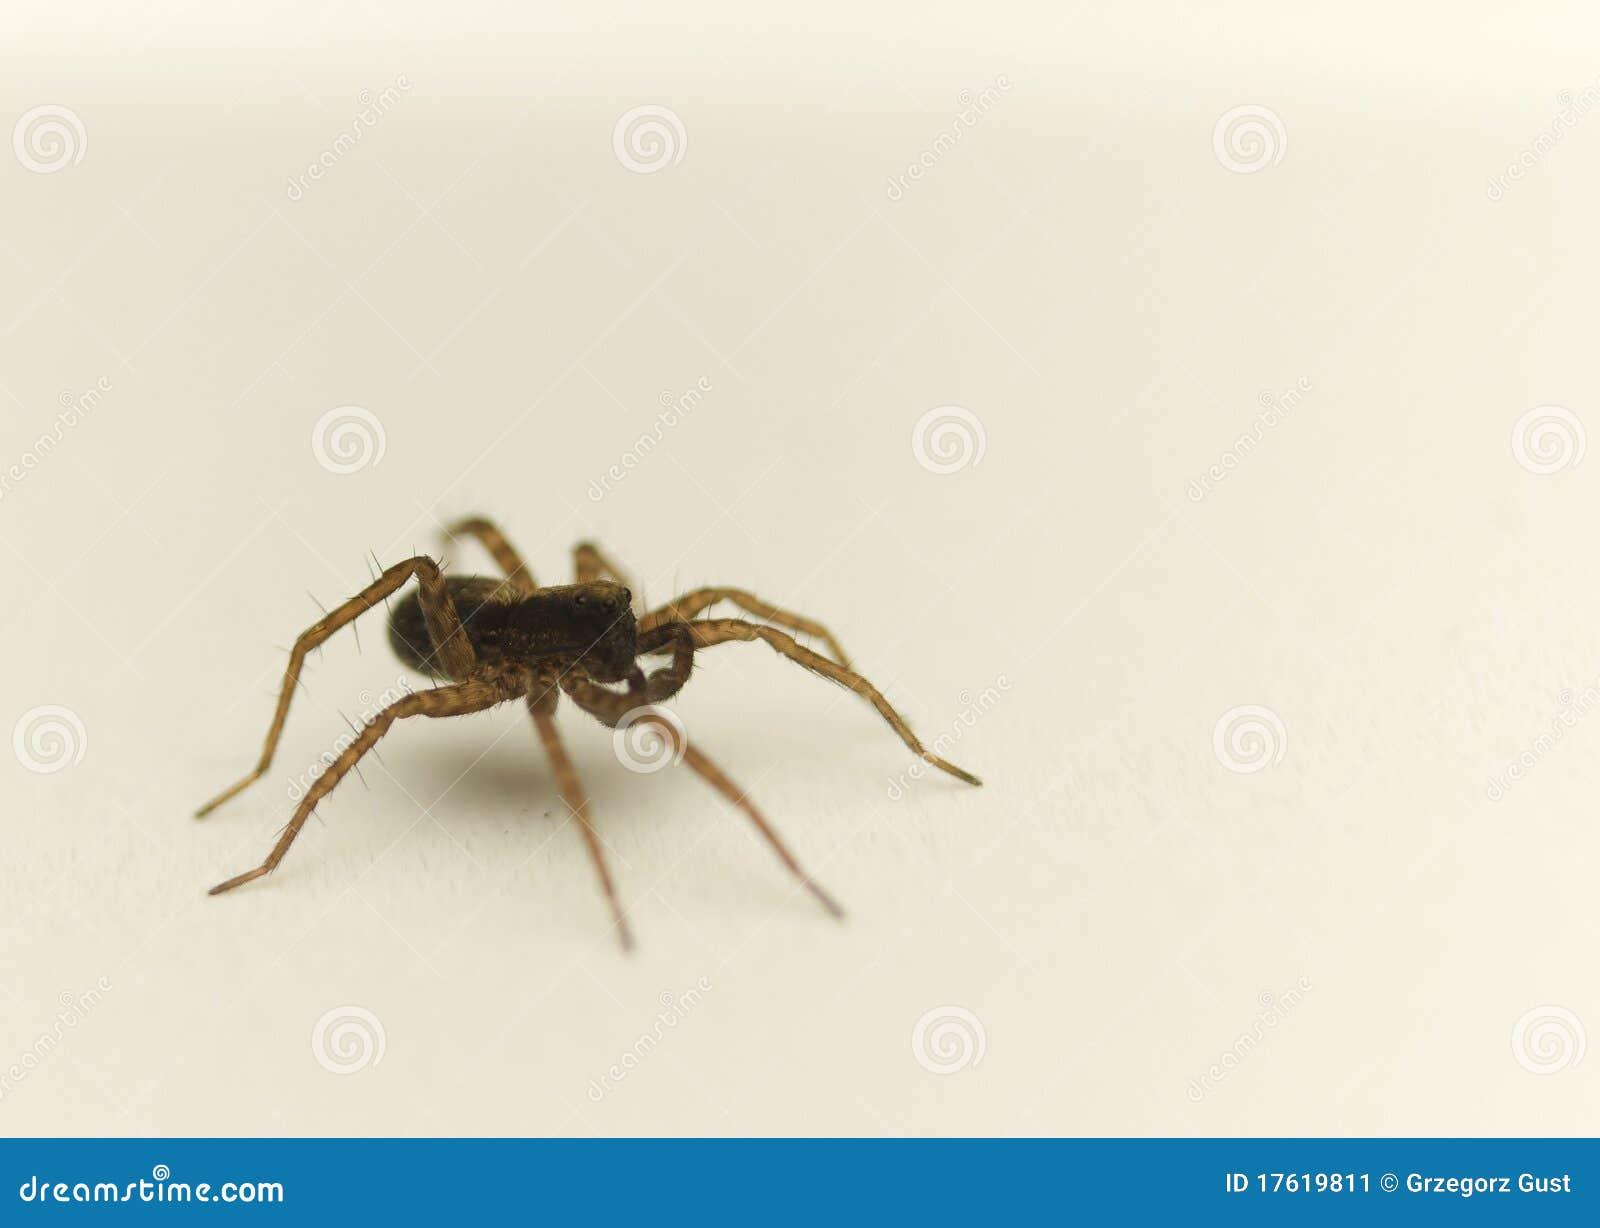 Pardosa amentata